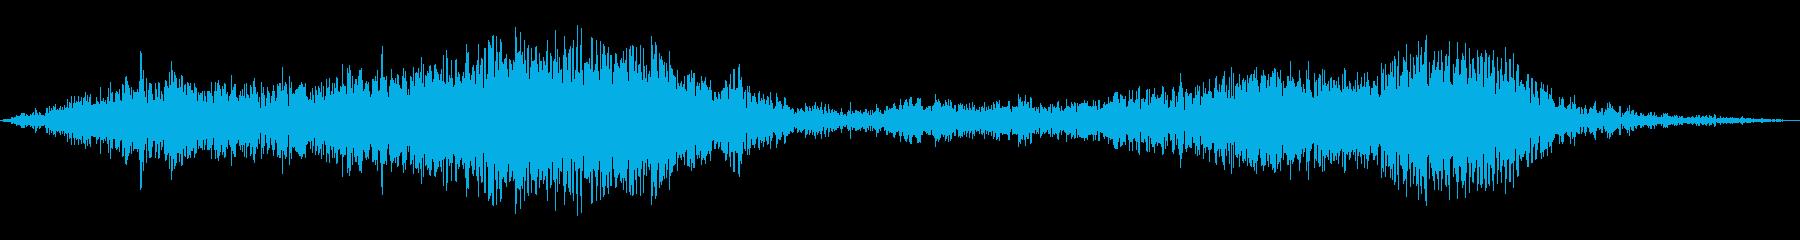 INT:SKIR AROUND C...の再生済みの波形